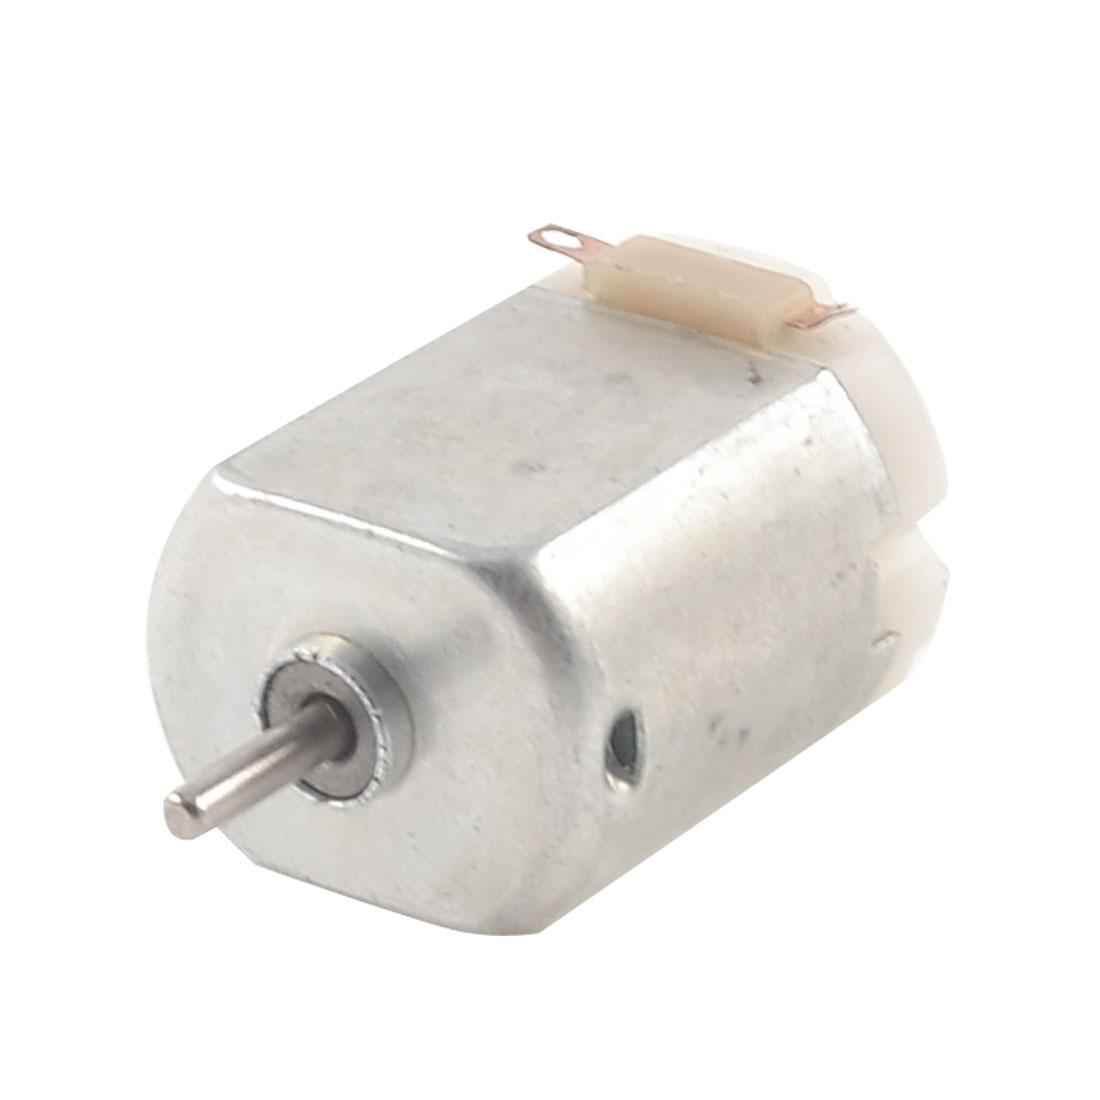 6000RPM 3V 0.08A High Torque Electric Mini DC Motor for DIY Toys